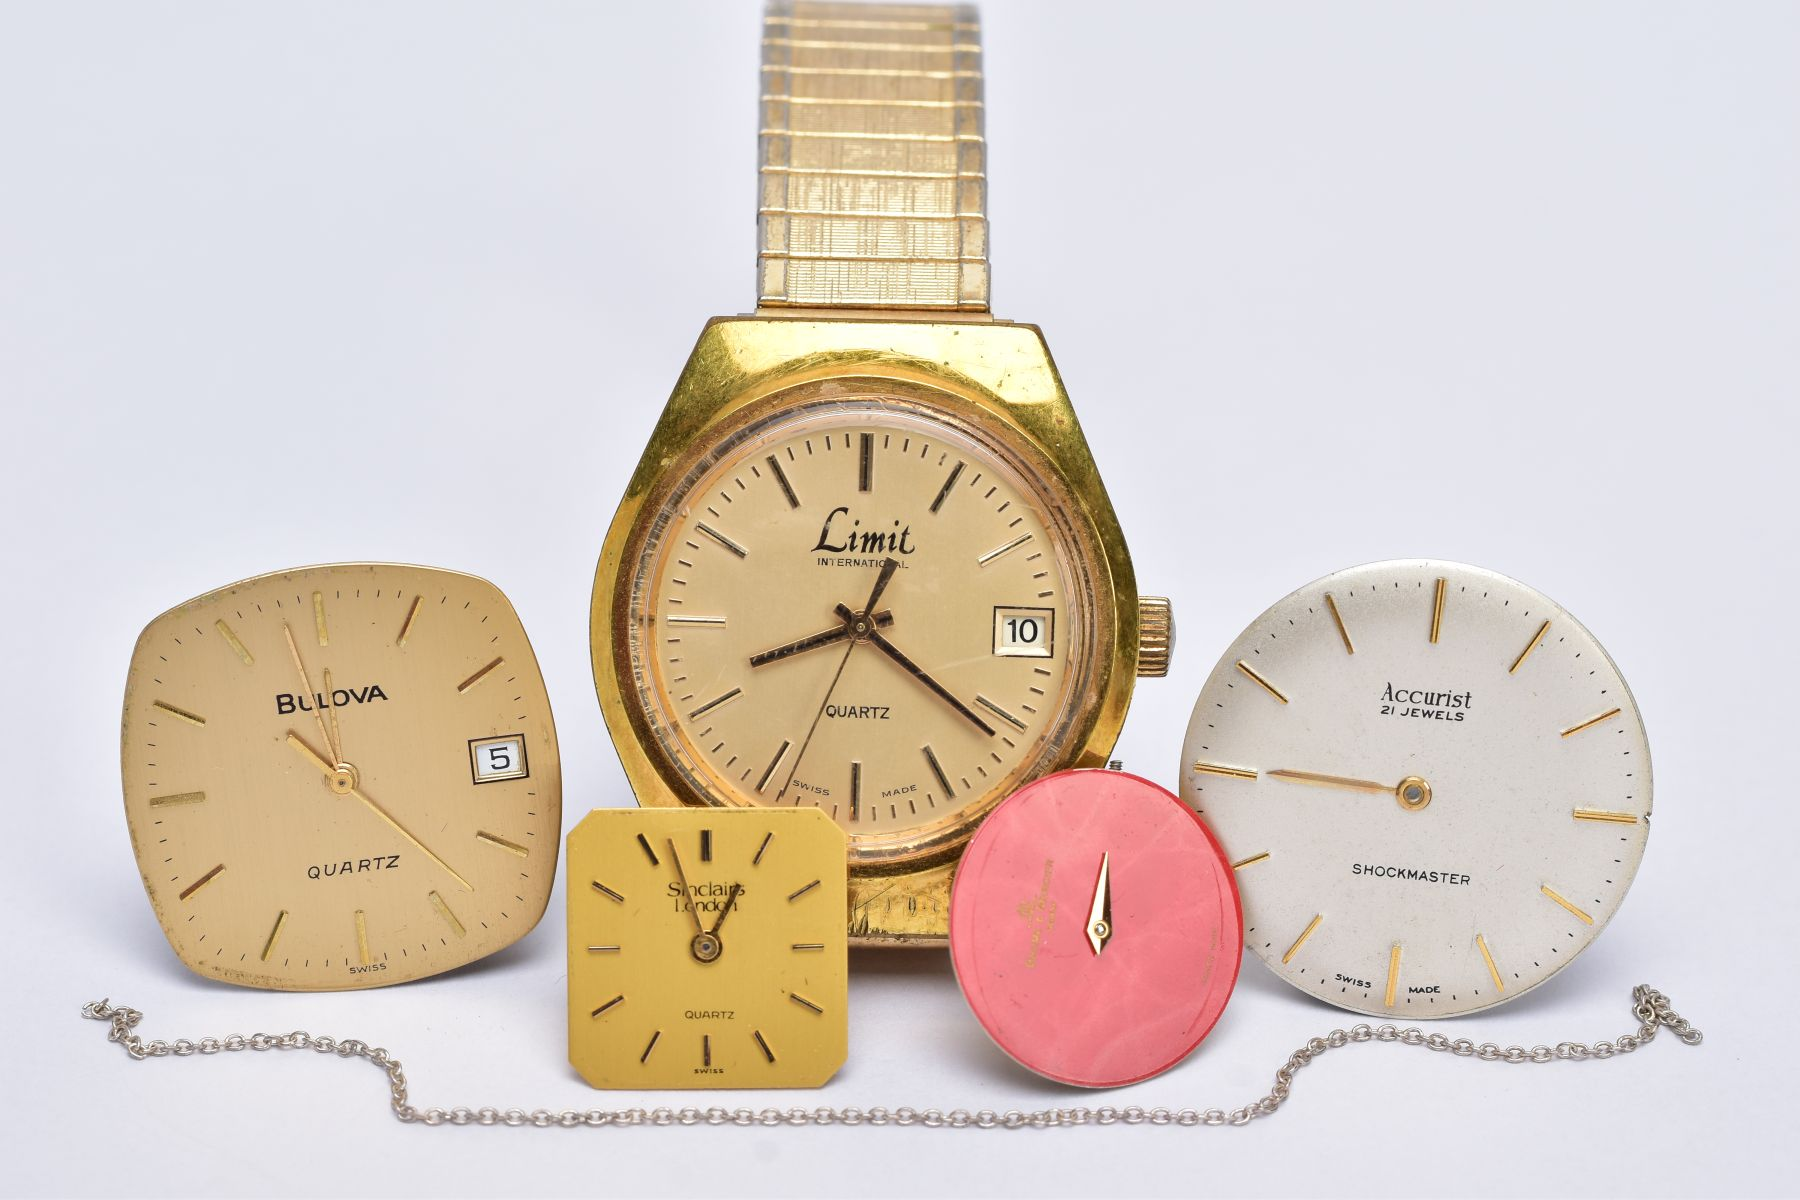 A GENTS 'LIMIT' WRISTWATCH AND WATCH PARTS, the quartz 'Limit' wristwatch, round gold dial signed '